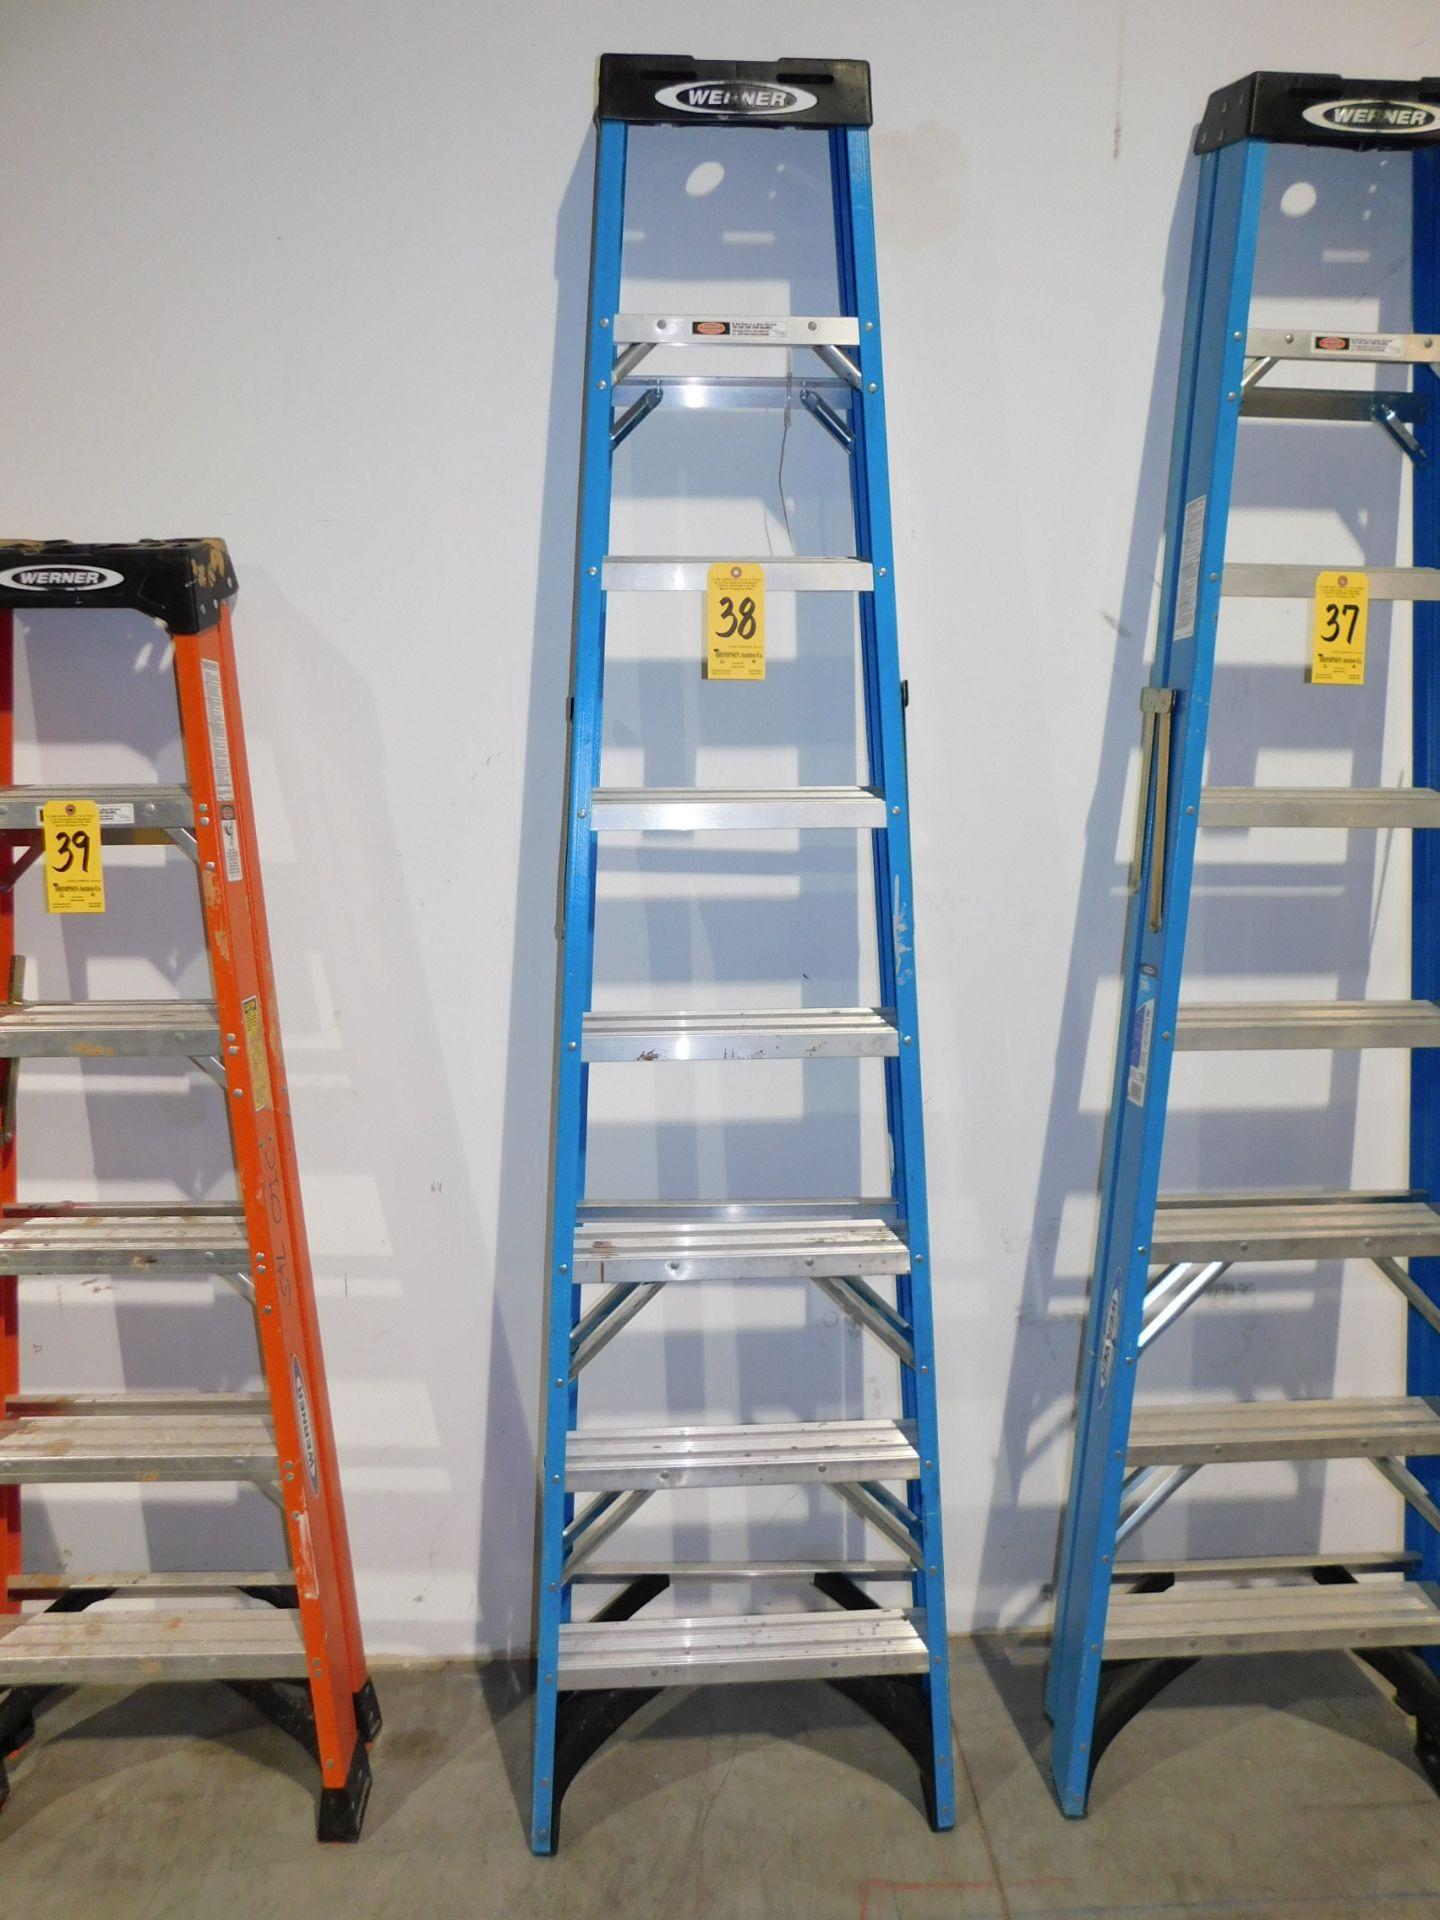 Lot 38 - Werner 8' Fiberglass Step Ladder